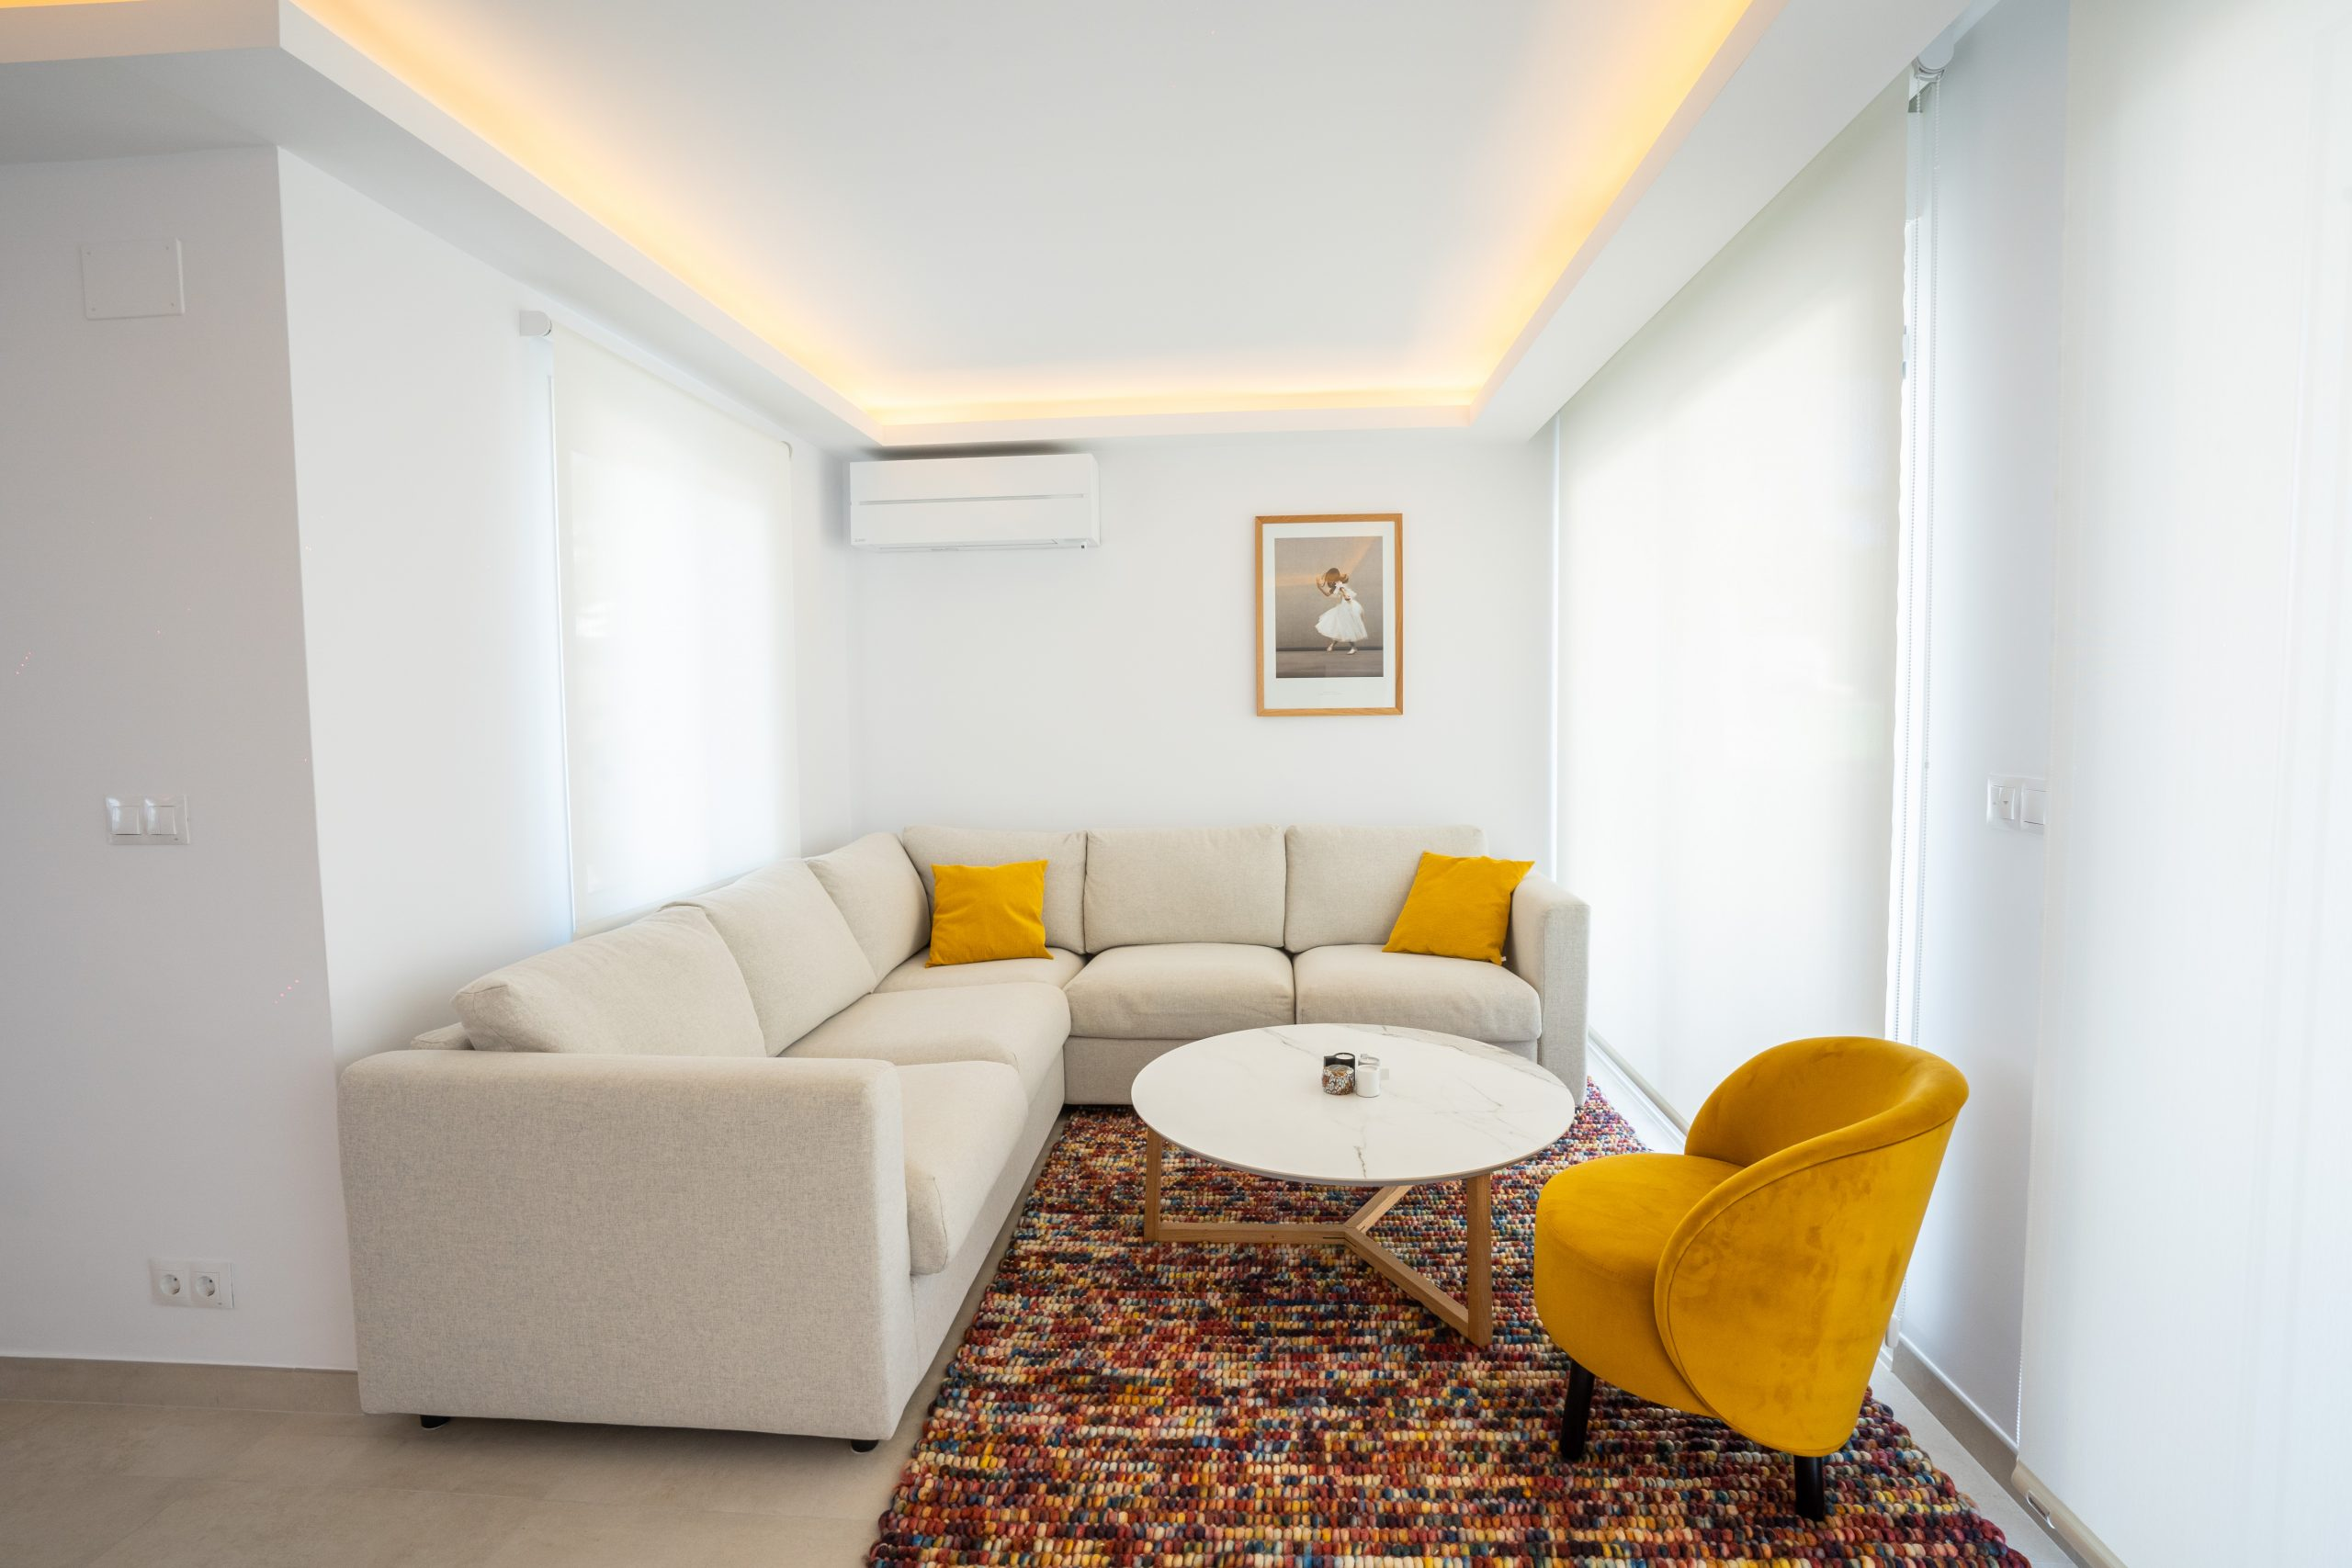 reforma salón villa con luminaria interior (1)